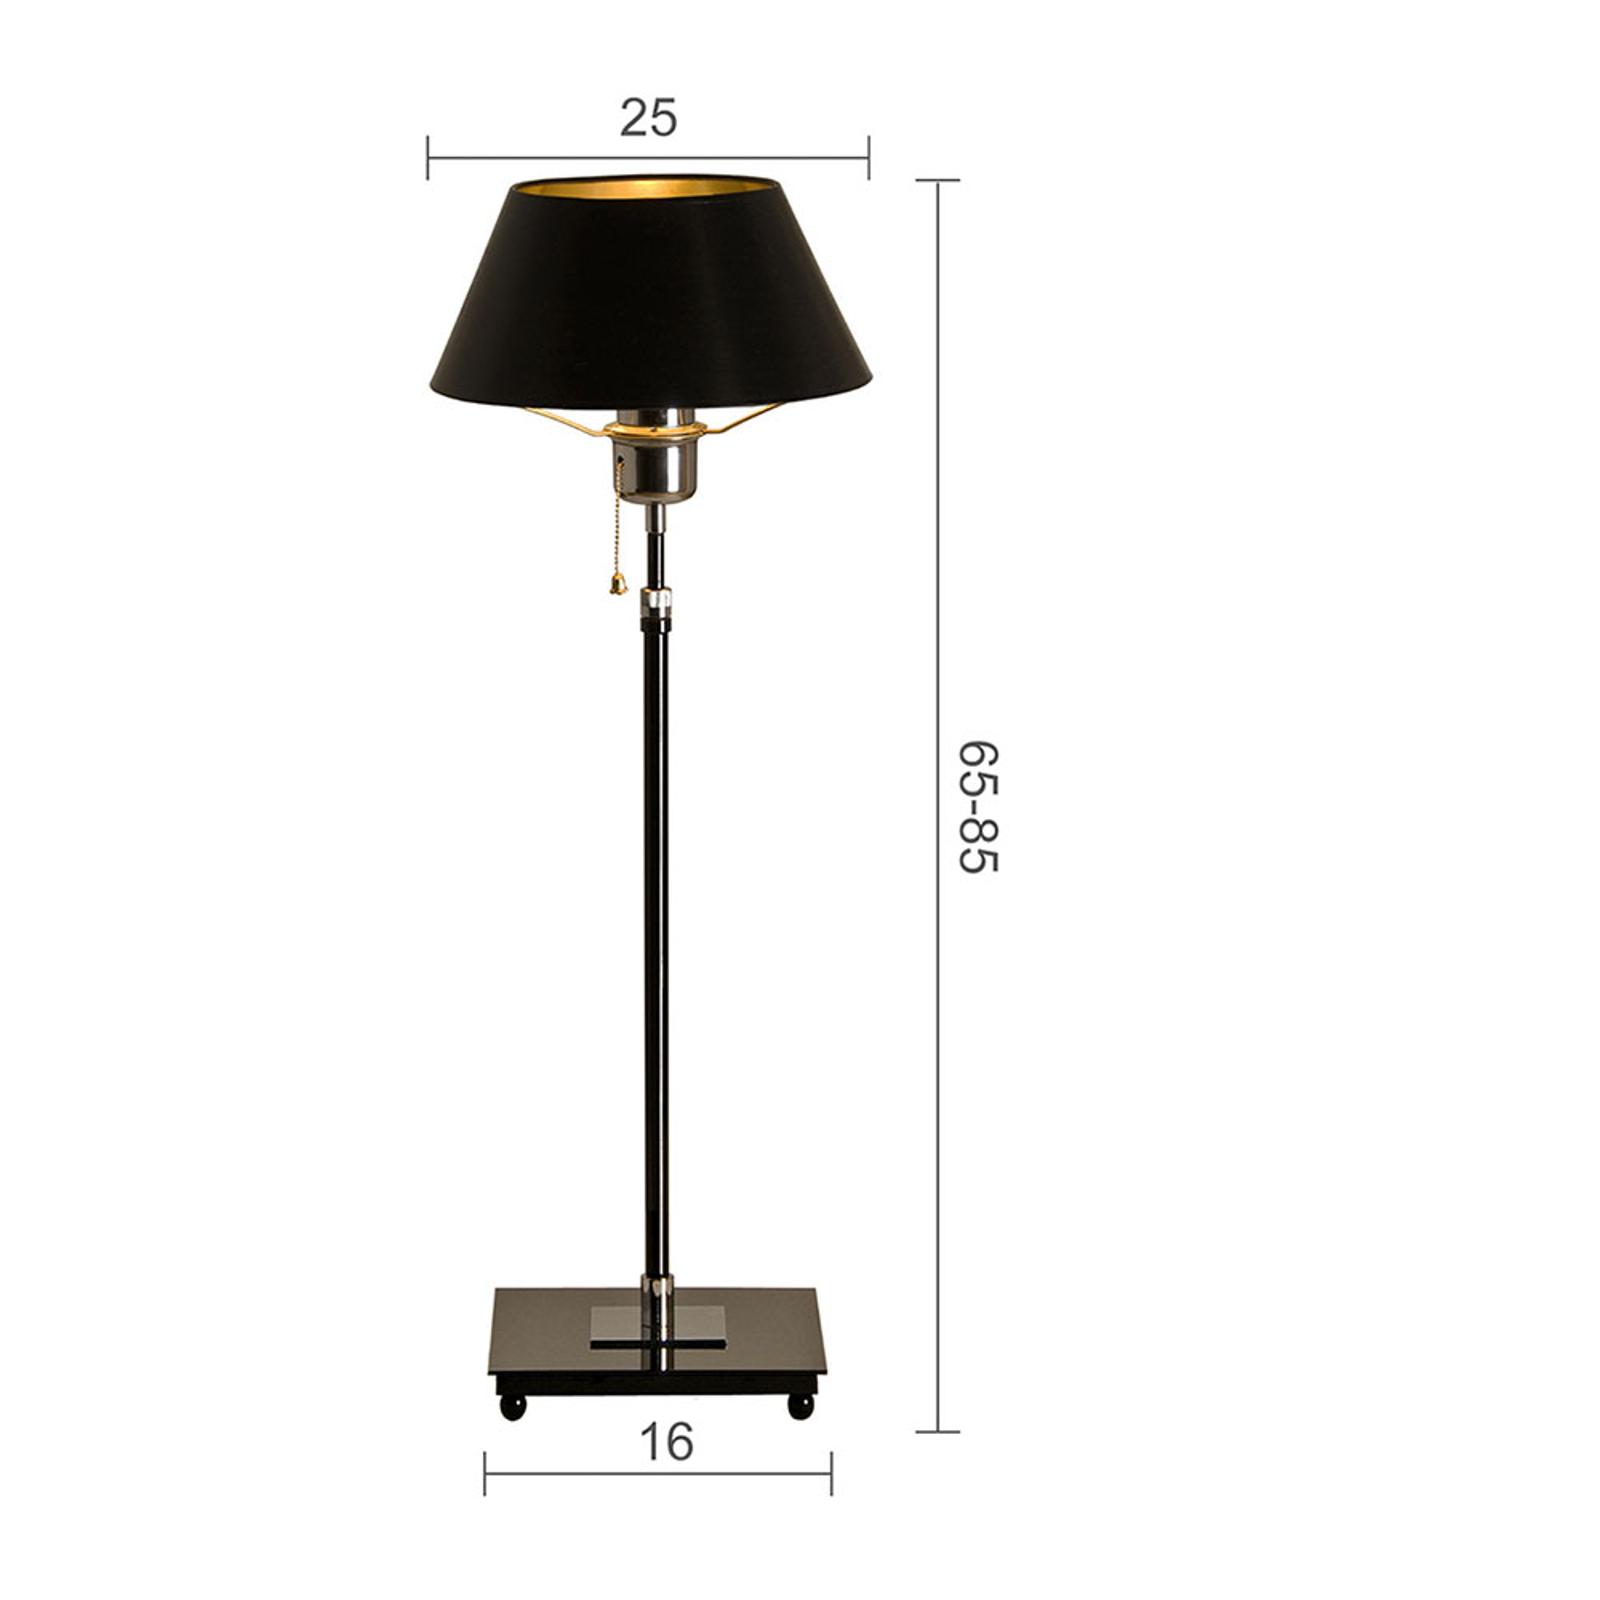 Menzel Antos AF4125 -pöytälamppu, musta varjostin